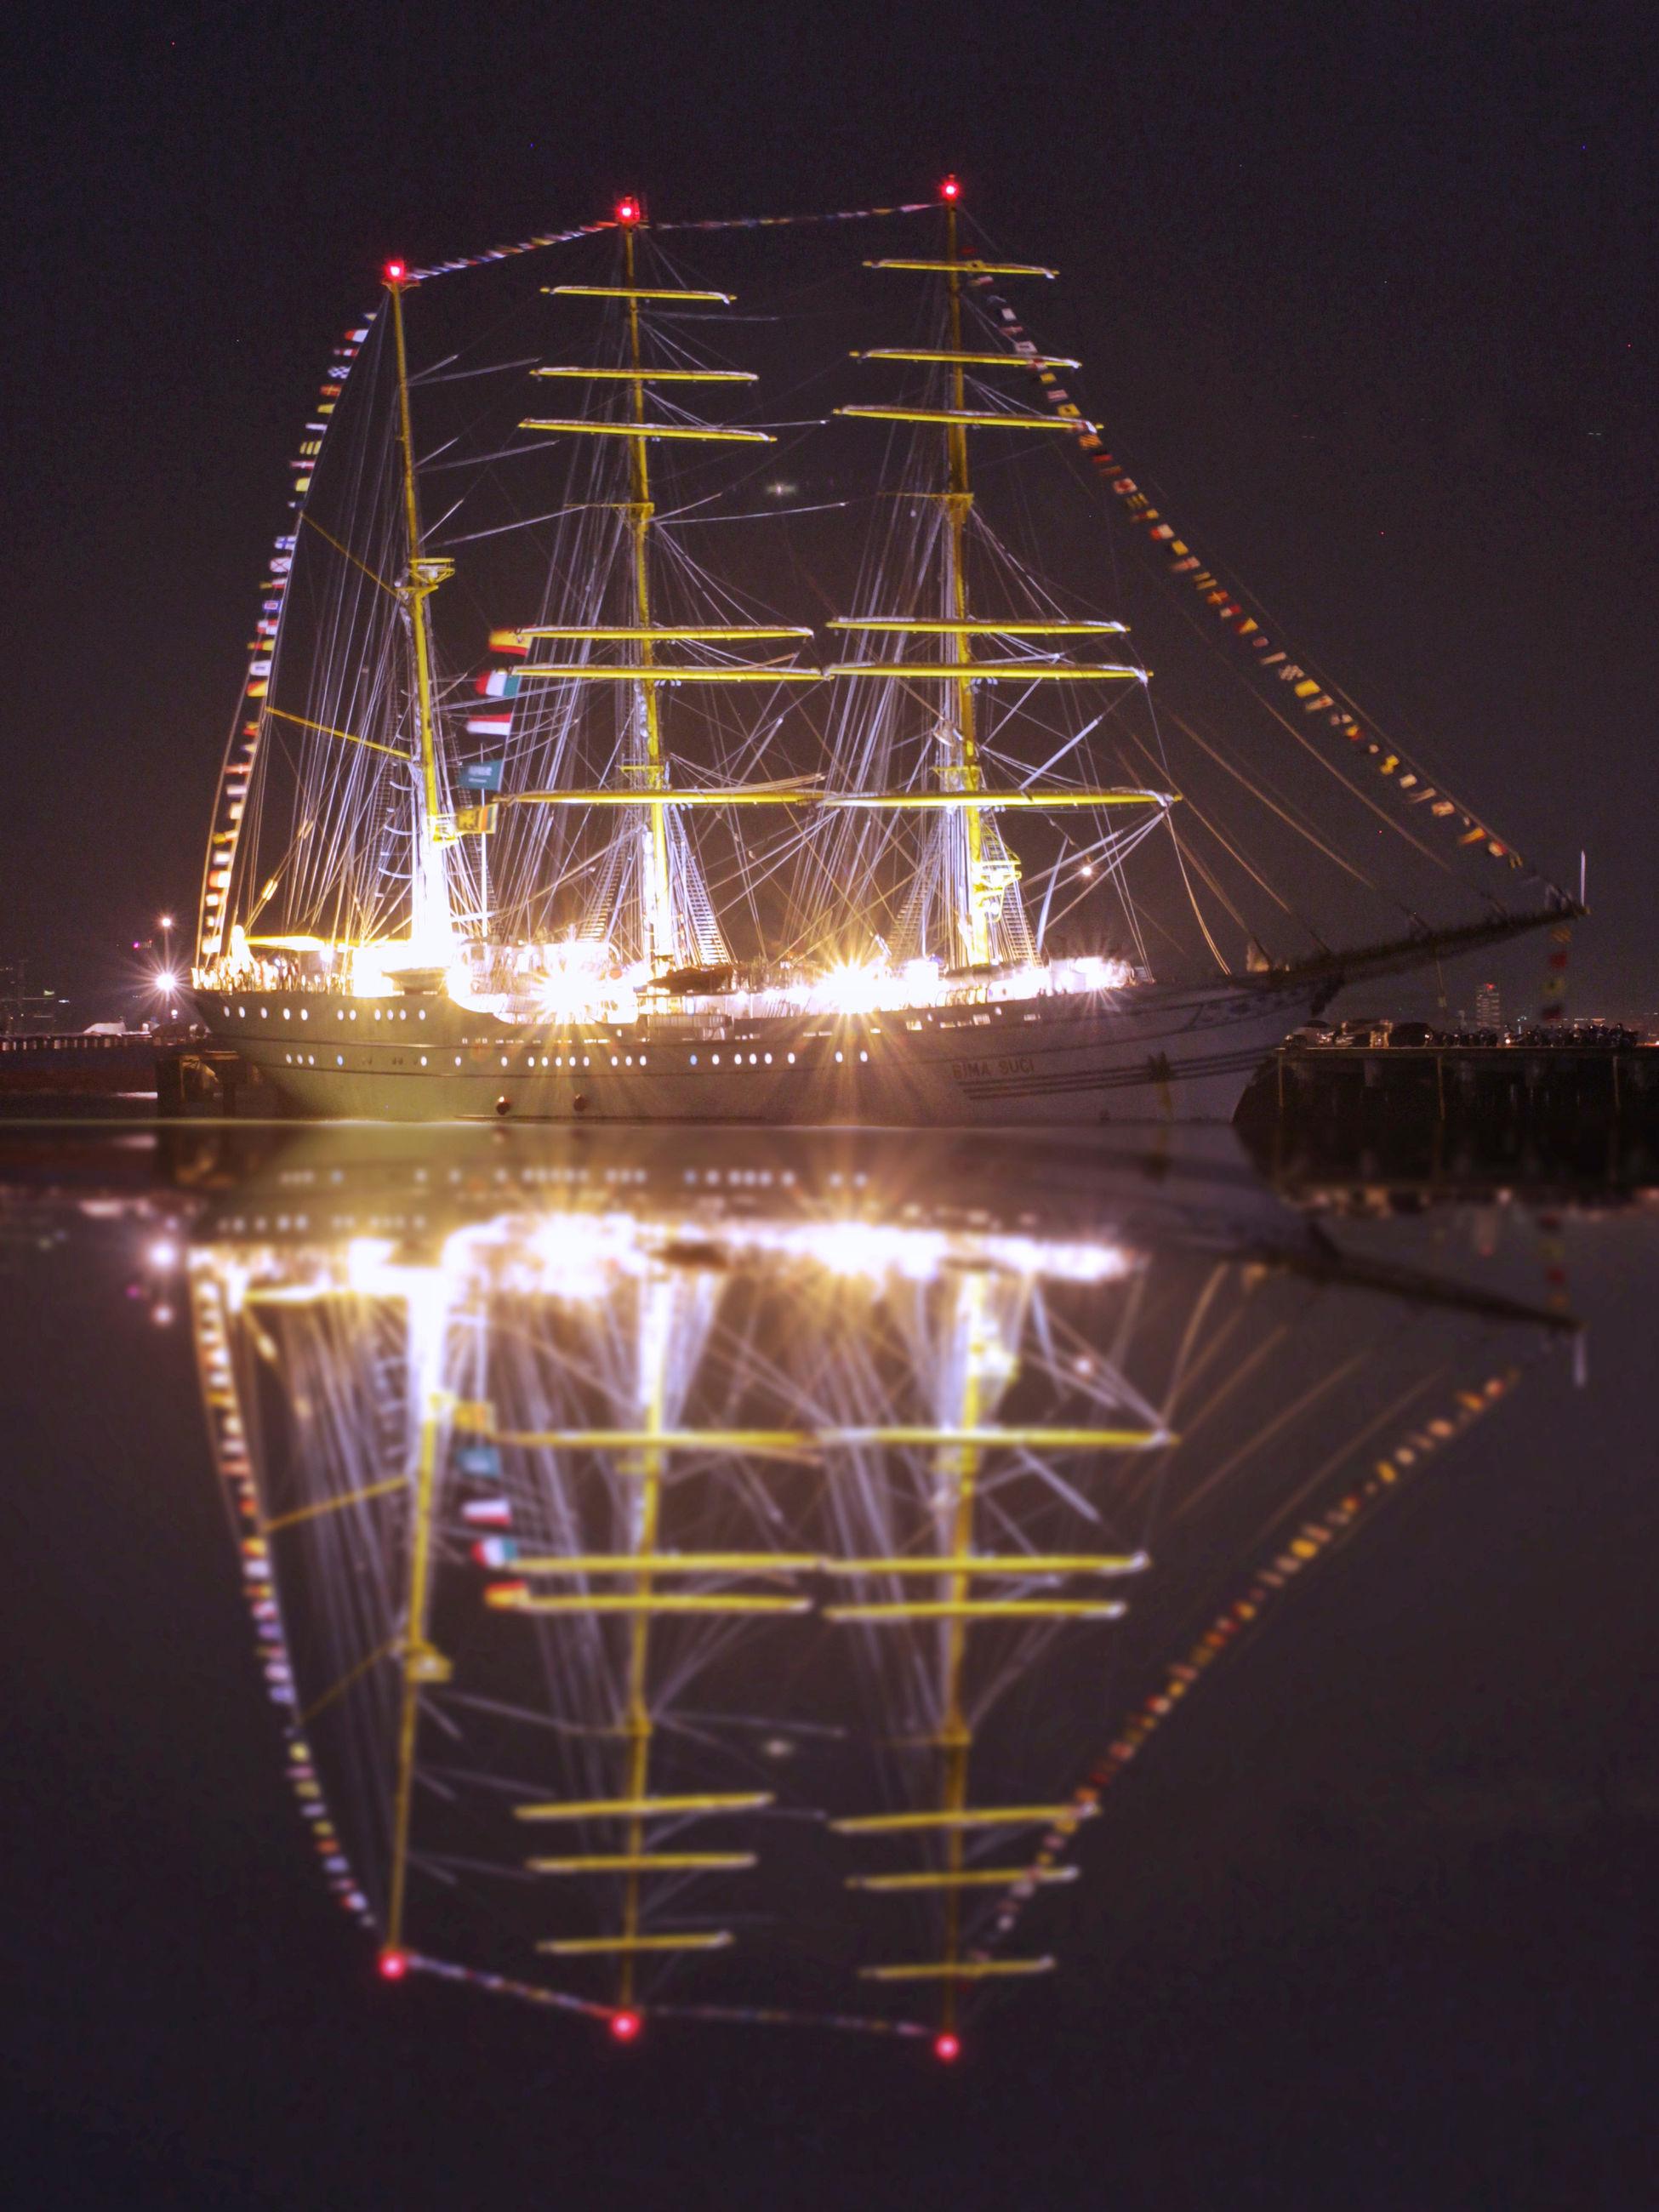 illuminated, night, no people, water, outdoors, sky, architecture, chain bridge, close-up